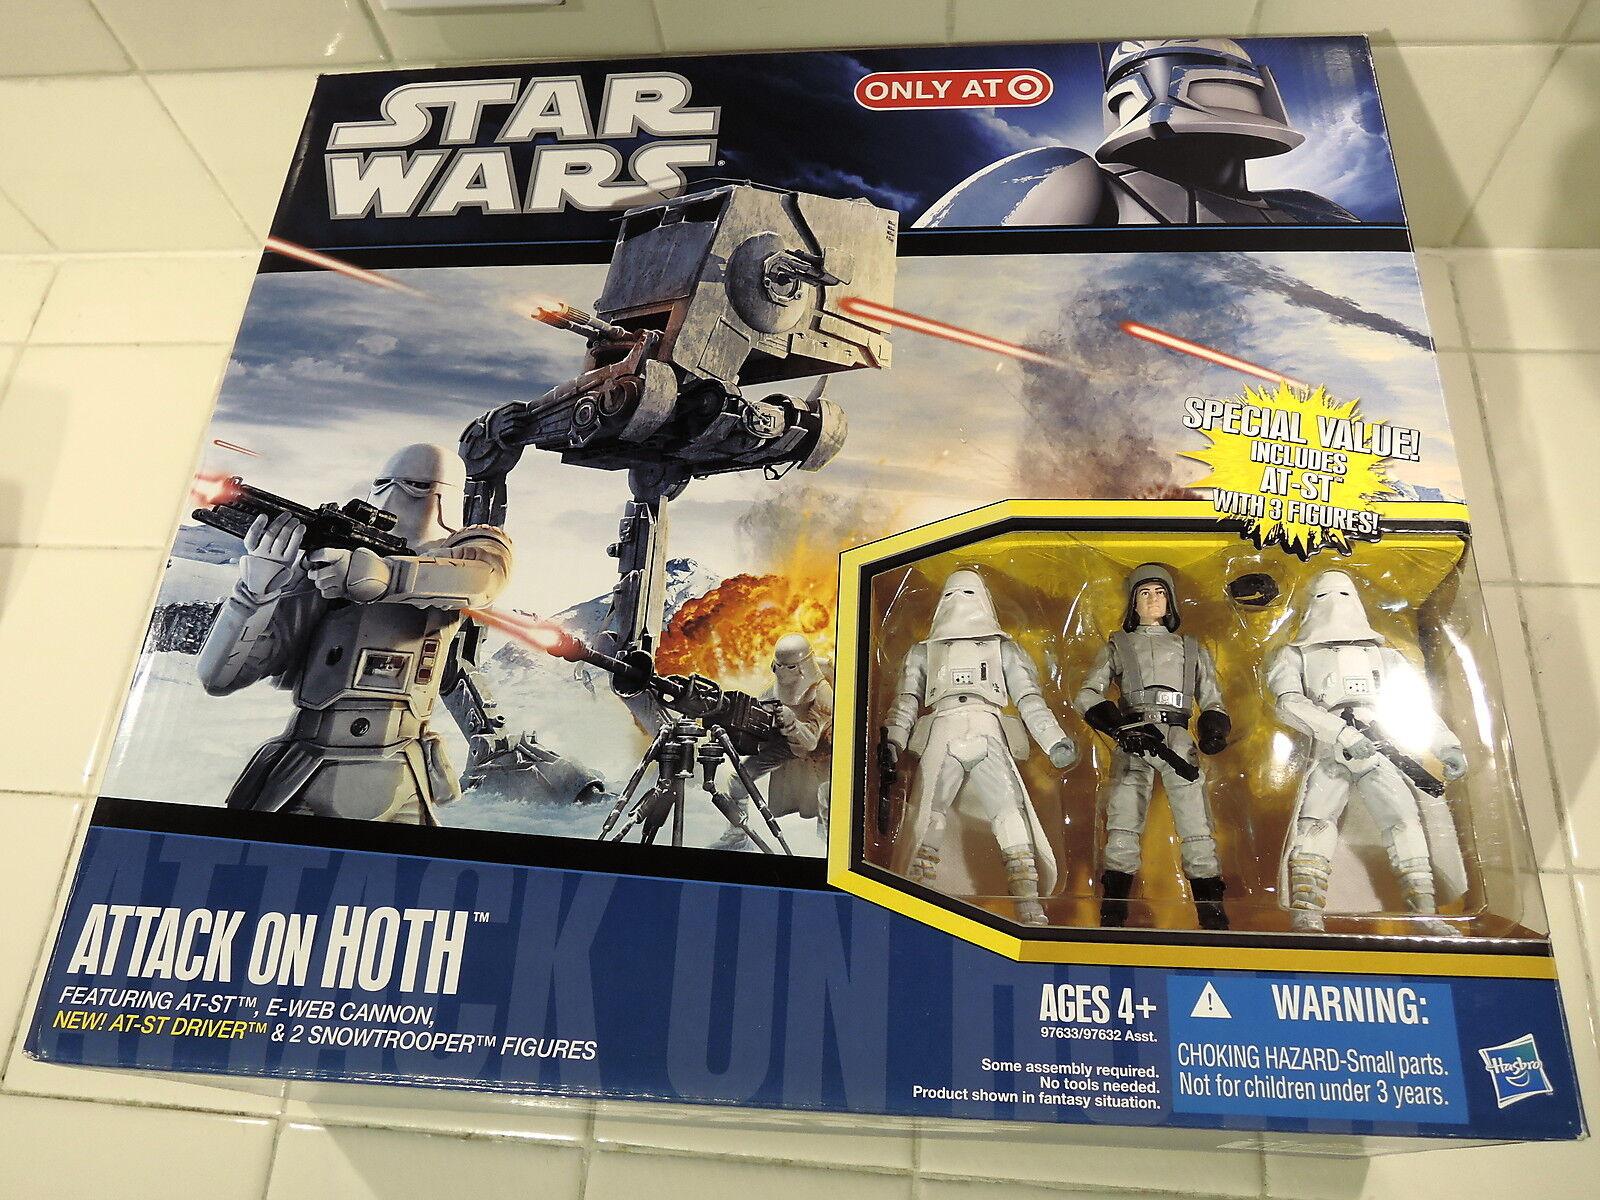 2010 Star Wars Objetivo Tesb Ataque Hoth Armar At-St Conductor